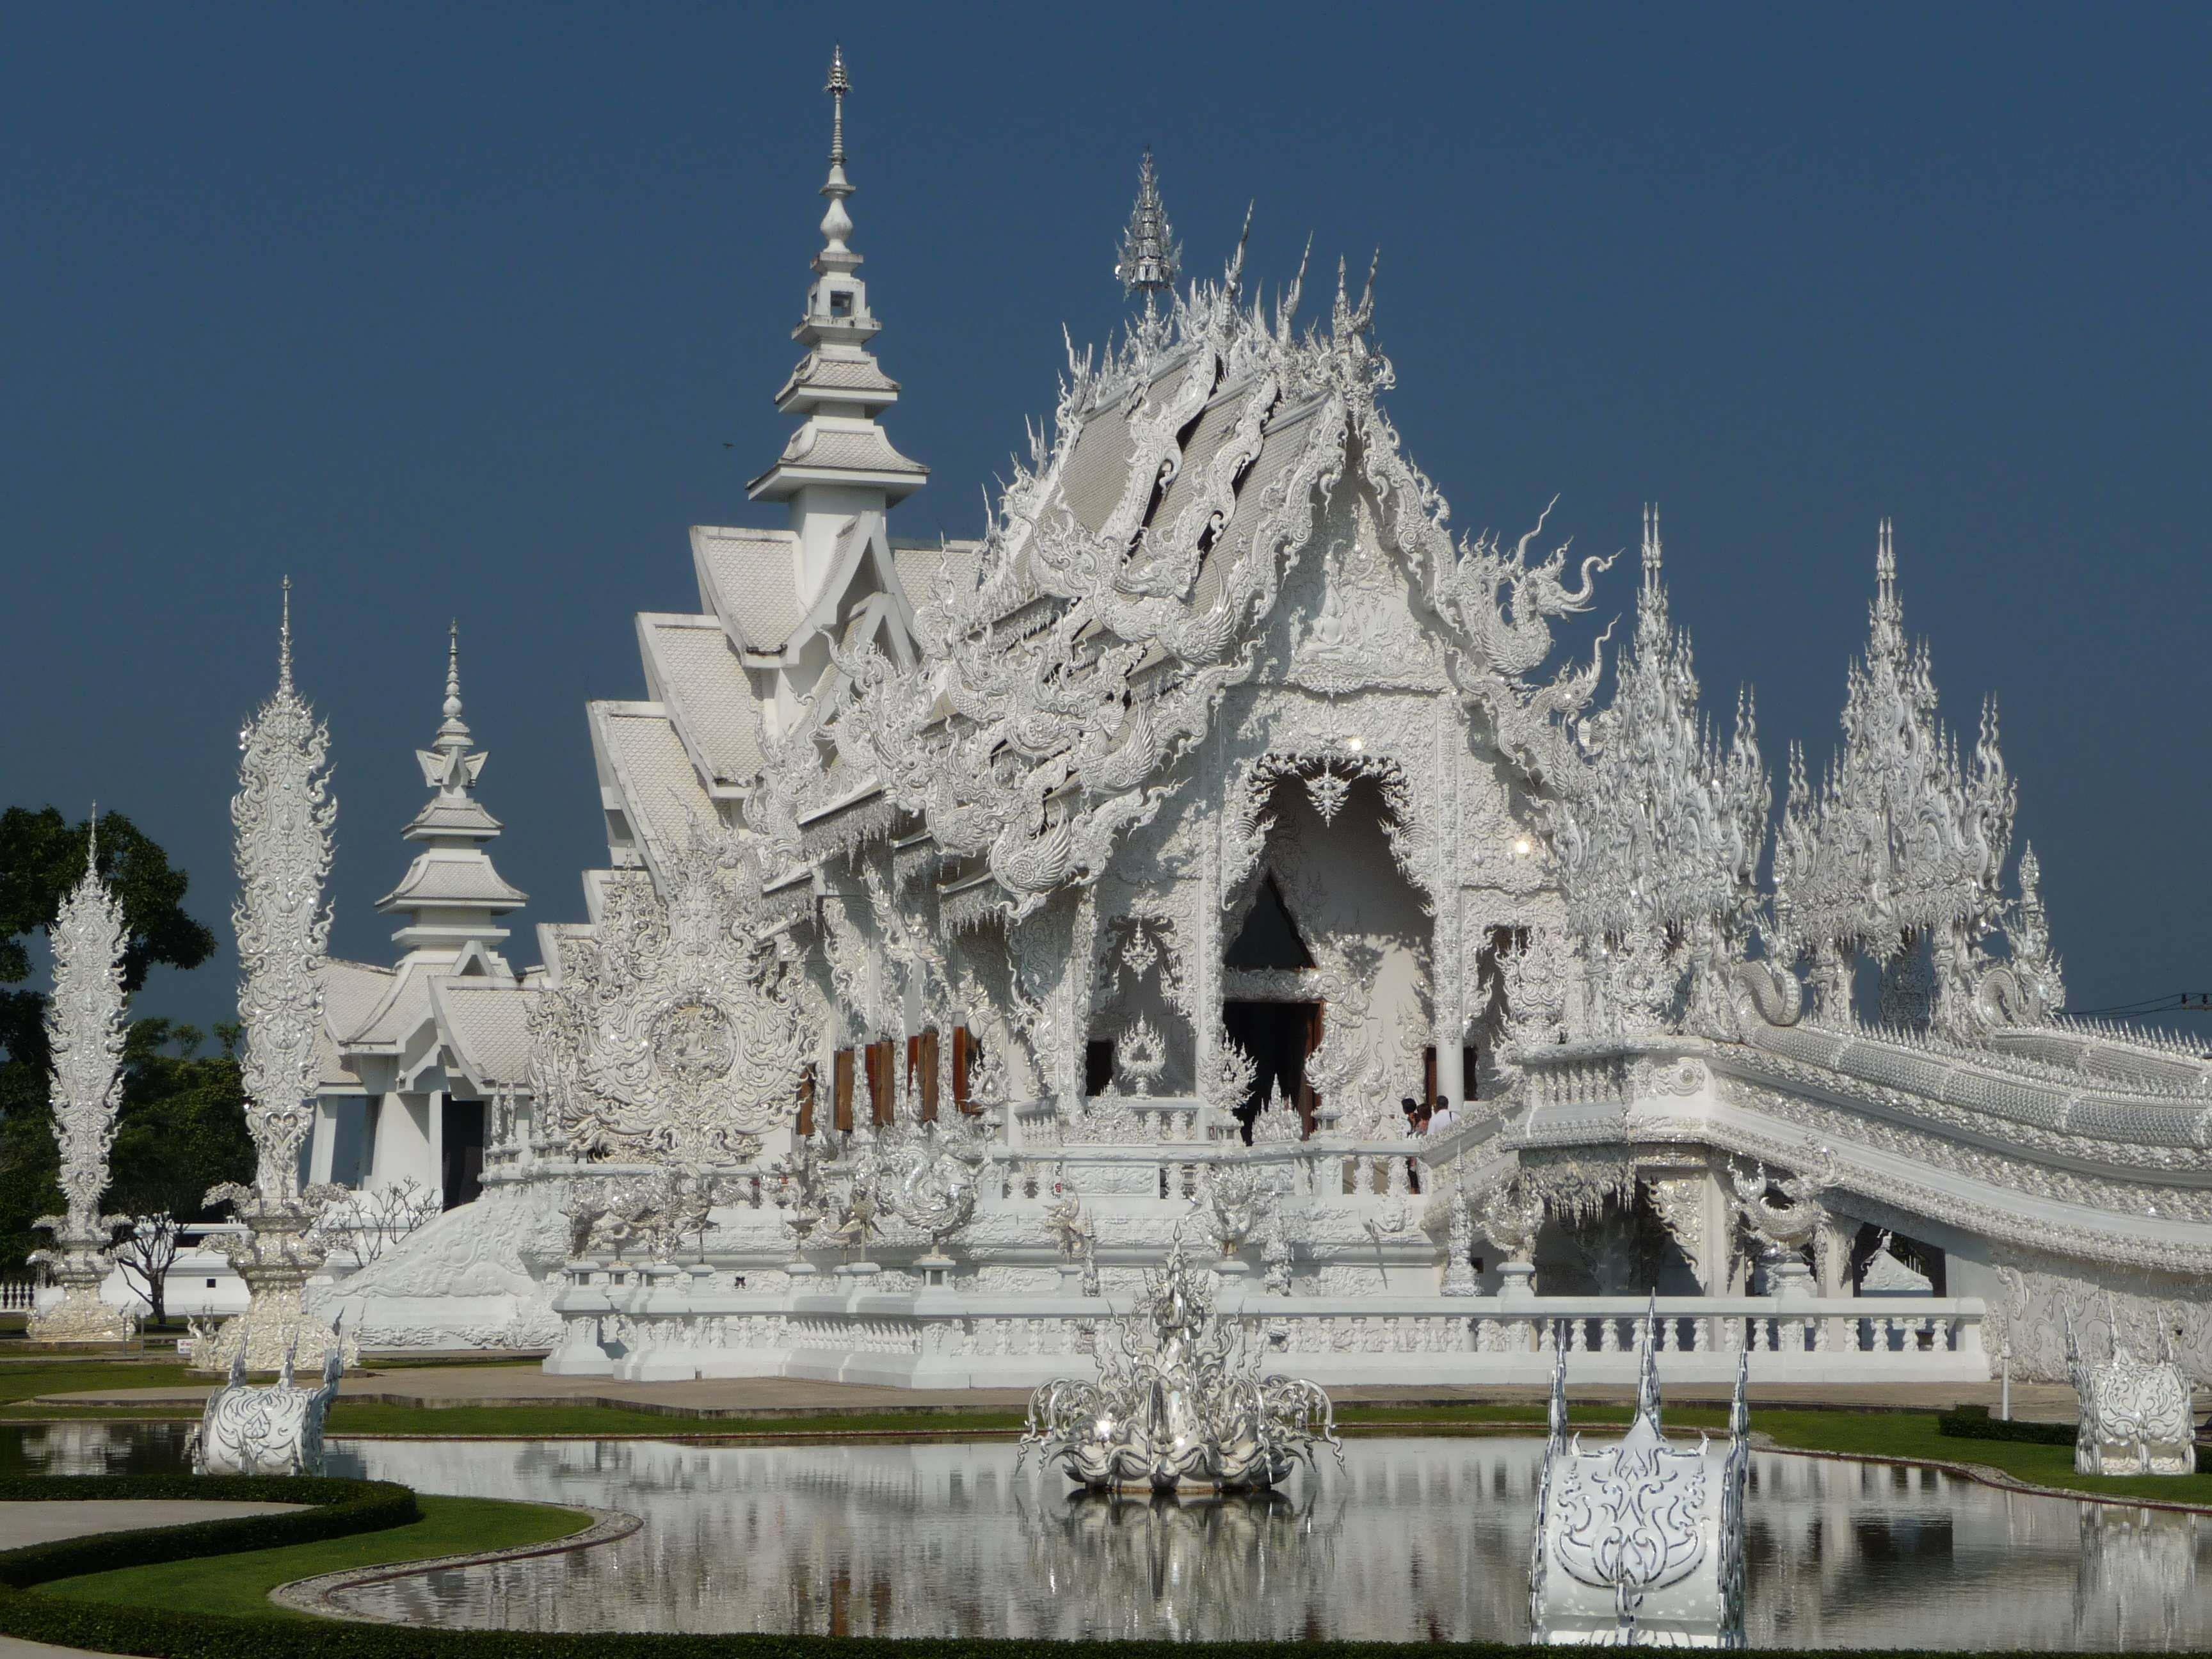 White church in the resort Chiang Mai, Thailand